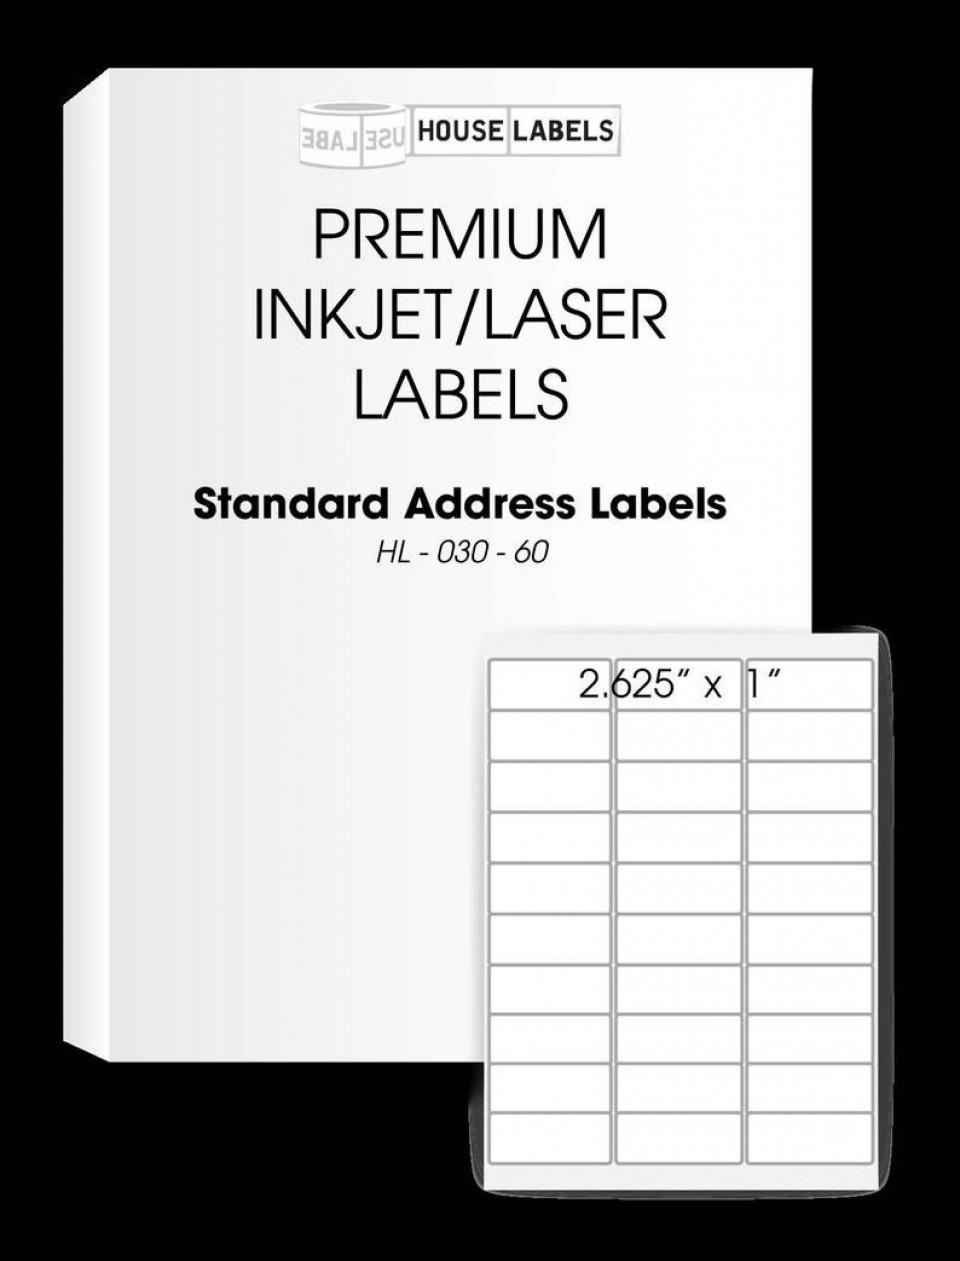 008 Unbelievable Free Return Addres Label Template 60 Per Sheet High Resolution 960